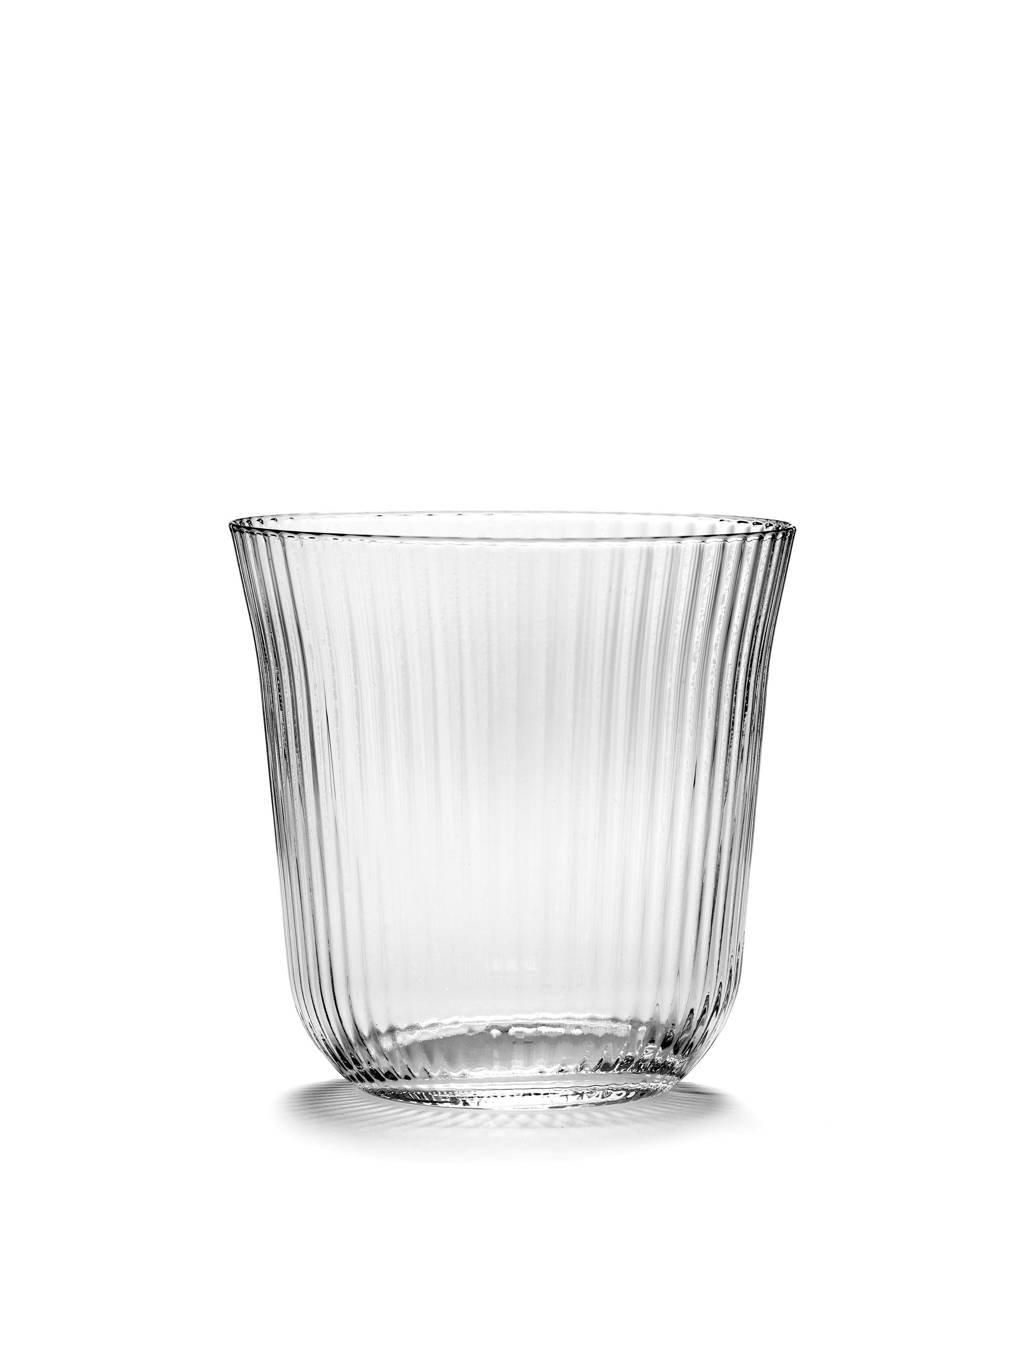 Serax waterglas Inku (30 cl), 300